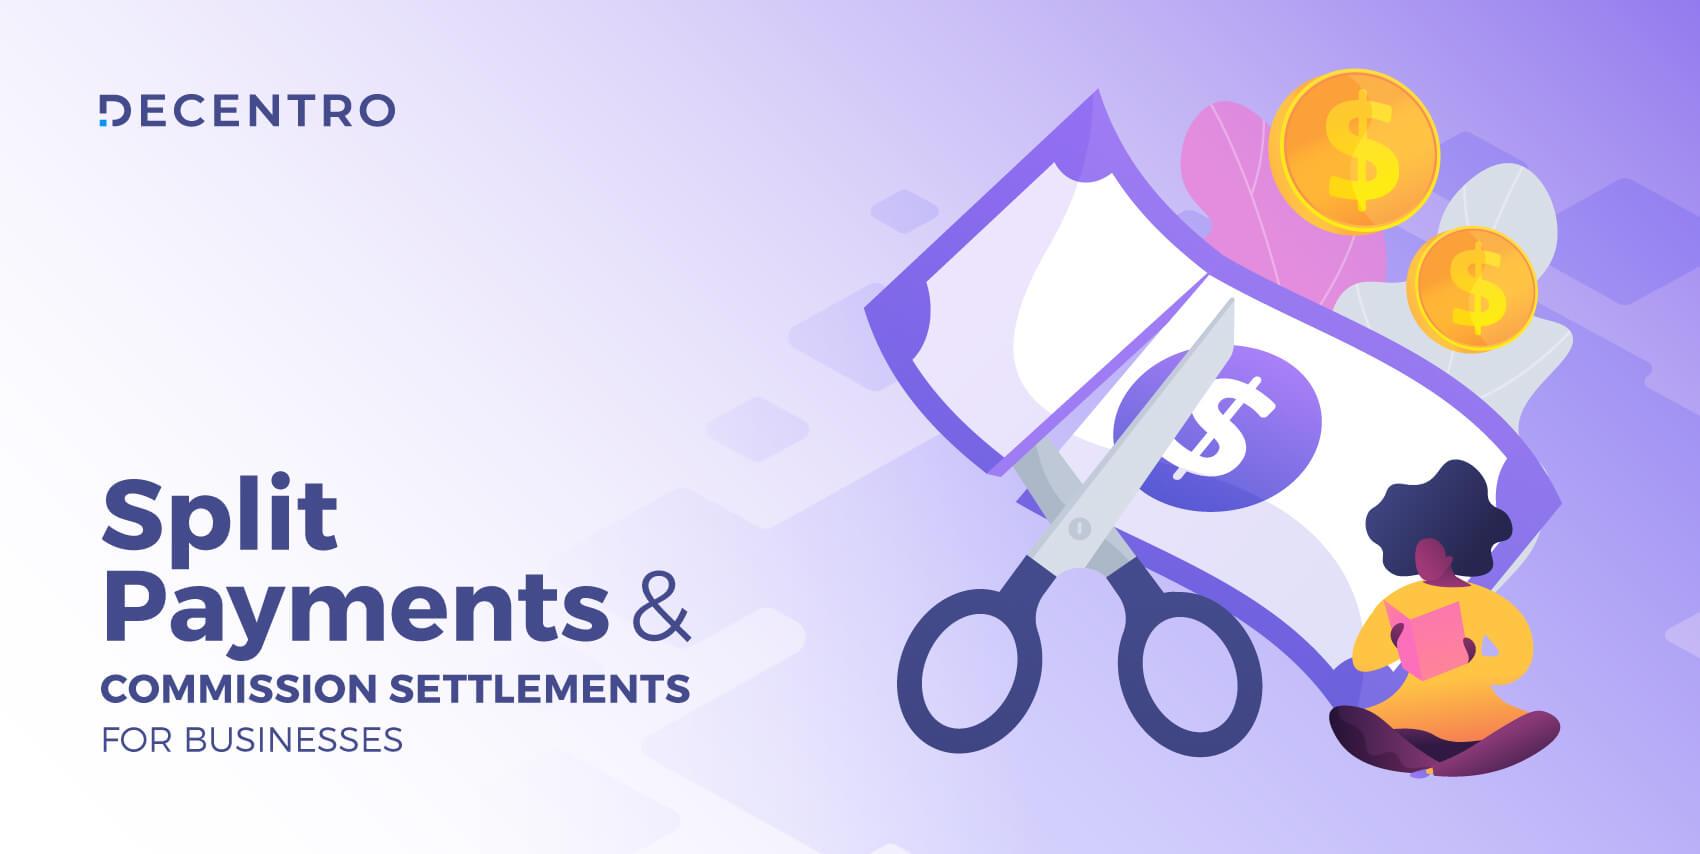 Enabling Split Payments & Commission Settlements For Businesses.